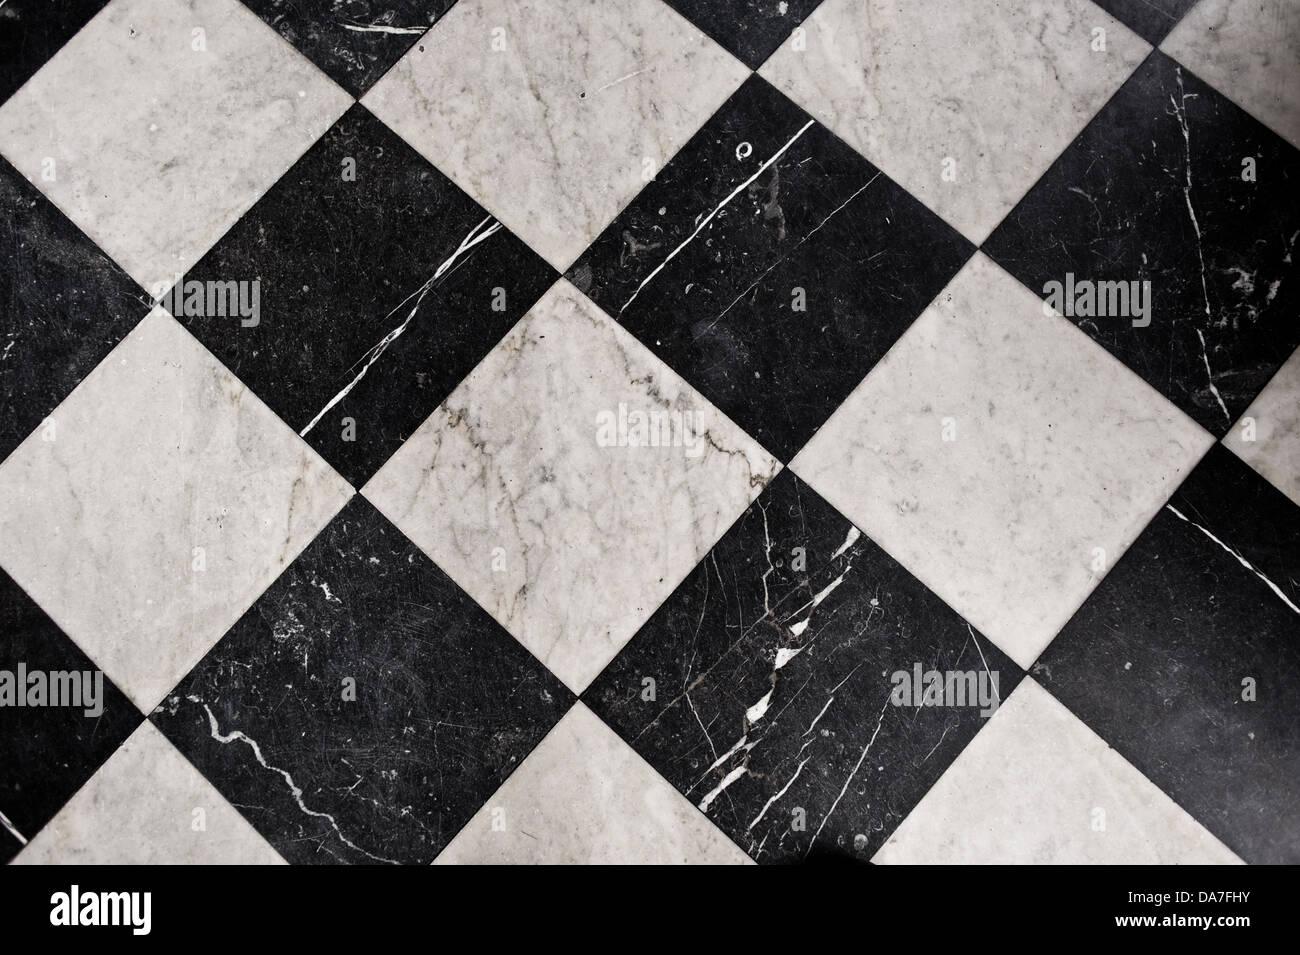 Black And White Marble Tiles Bathroom Flooring Stock